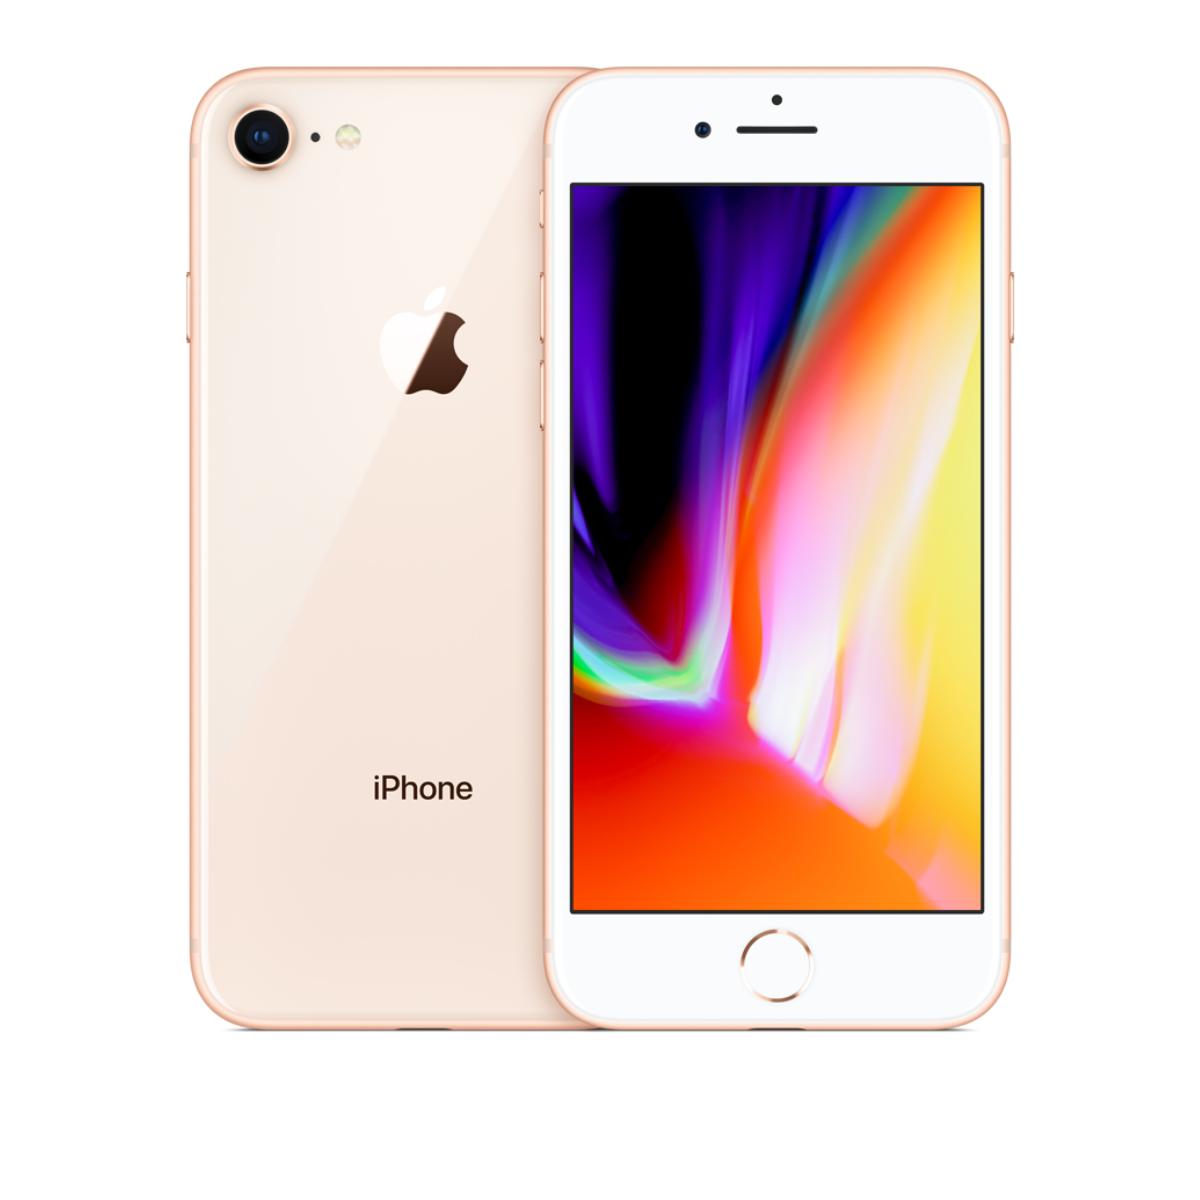 Sim Free iPhone 8 64GB Unlocked Mobile Phone - Gold